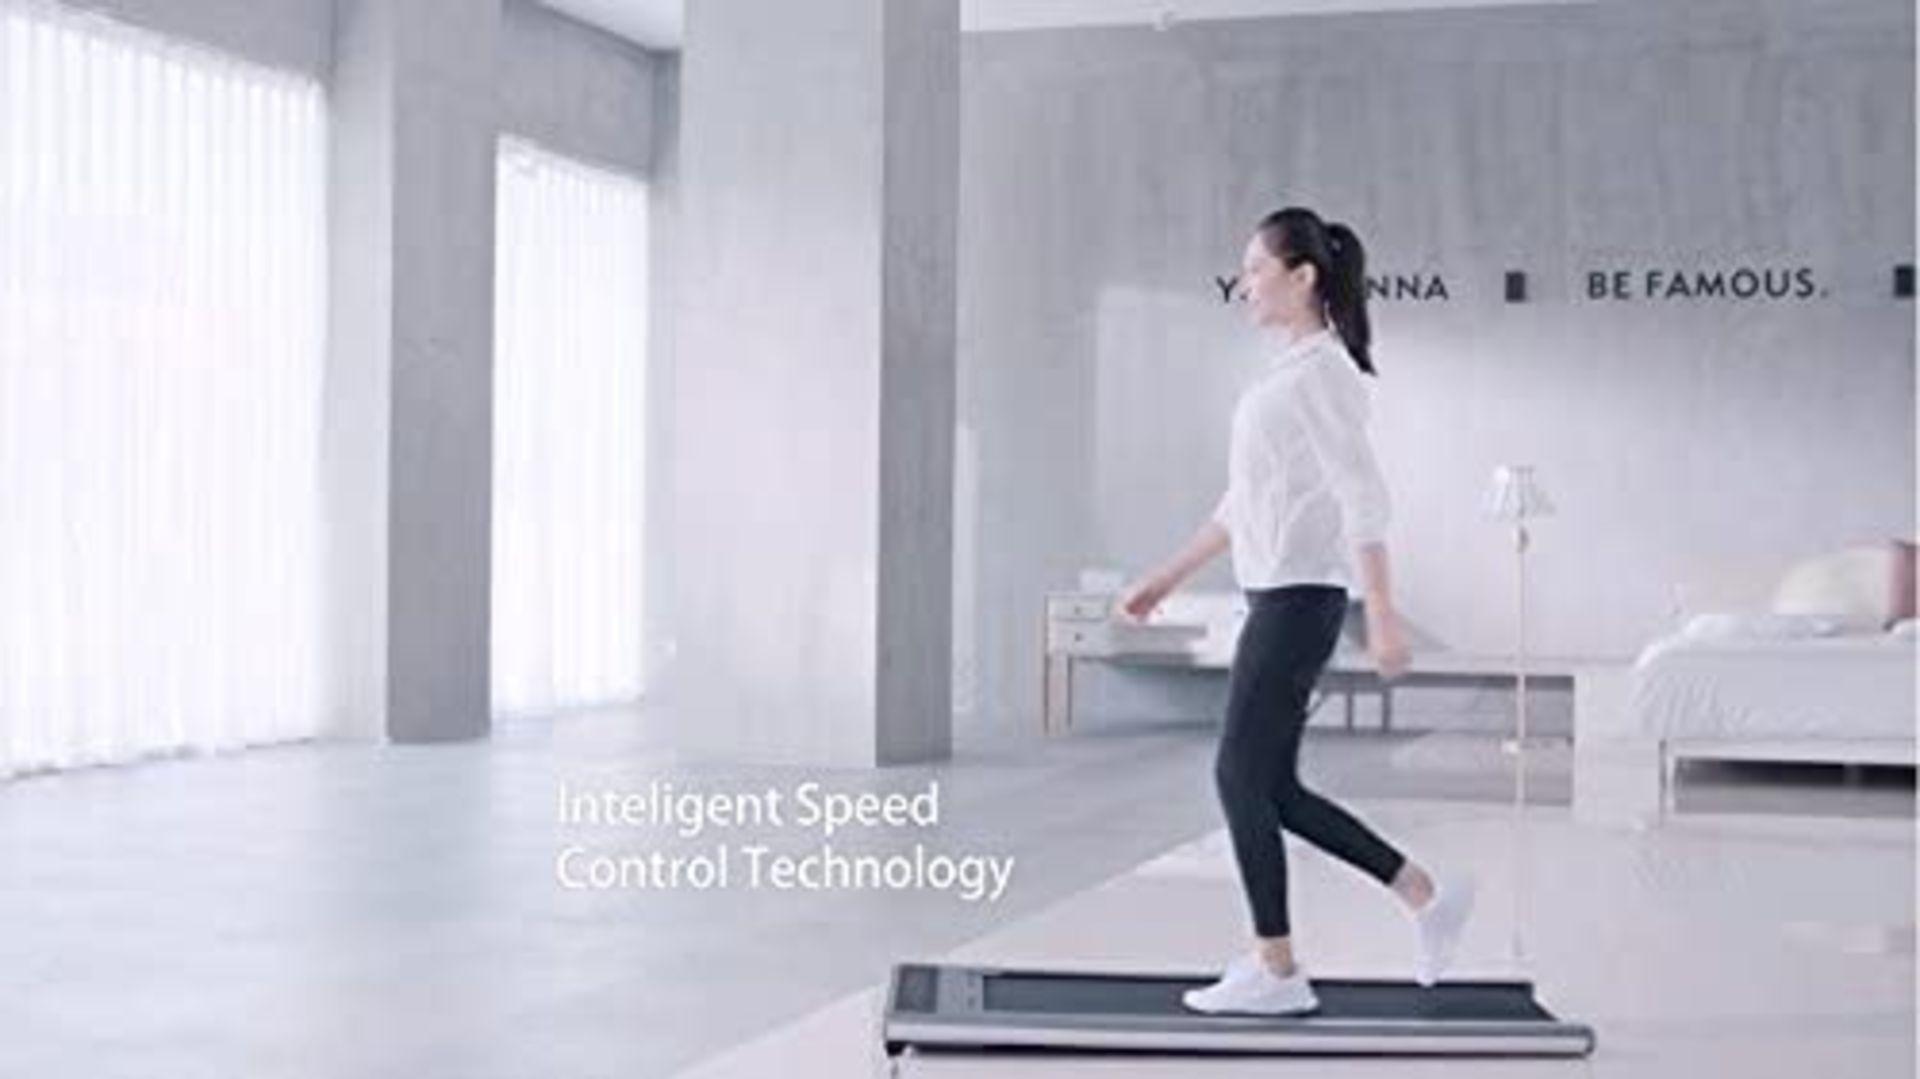 1 x Slim Tread Ultra Thin Smart Treadmill Running / Walking Machine - Lightweight With Folding - Image 16 of 19